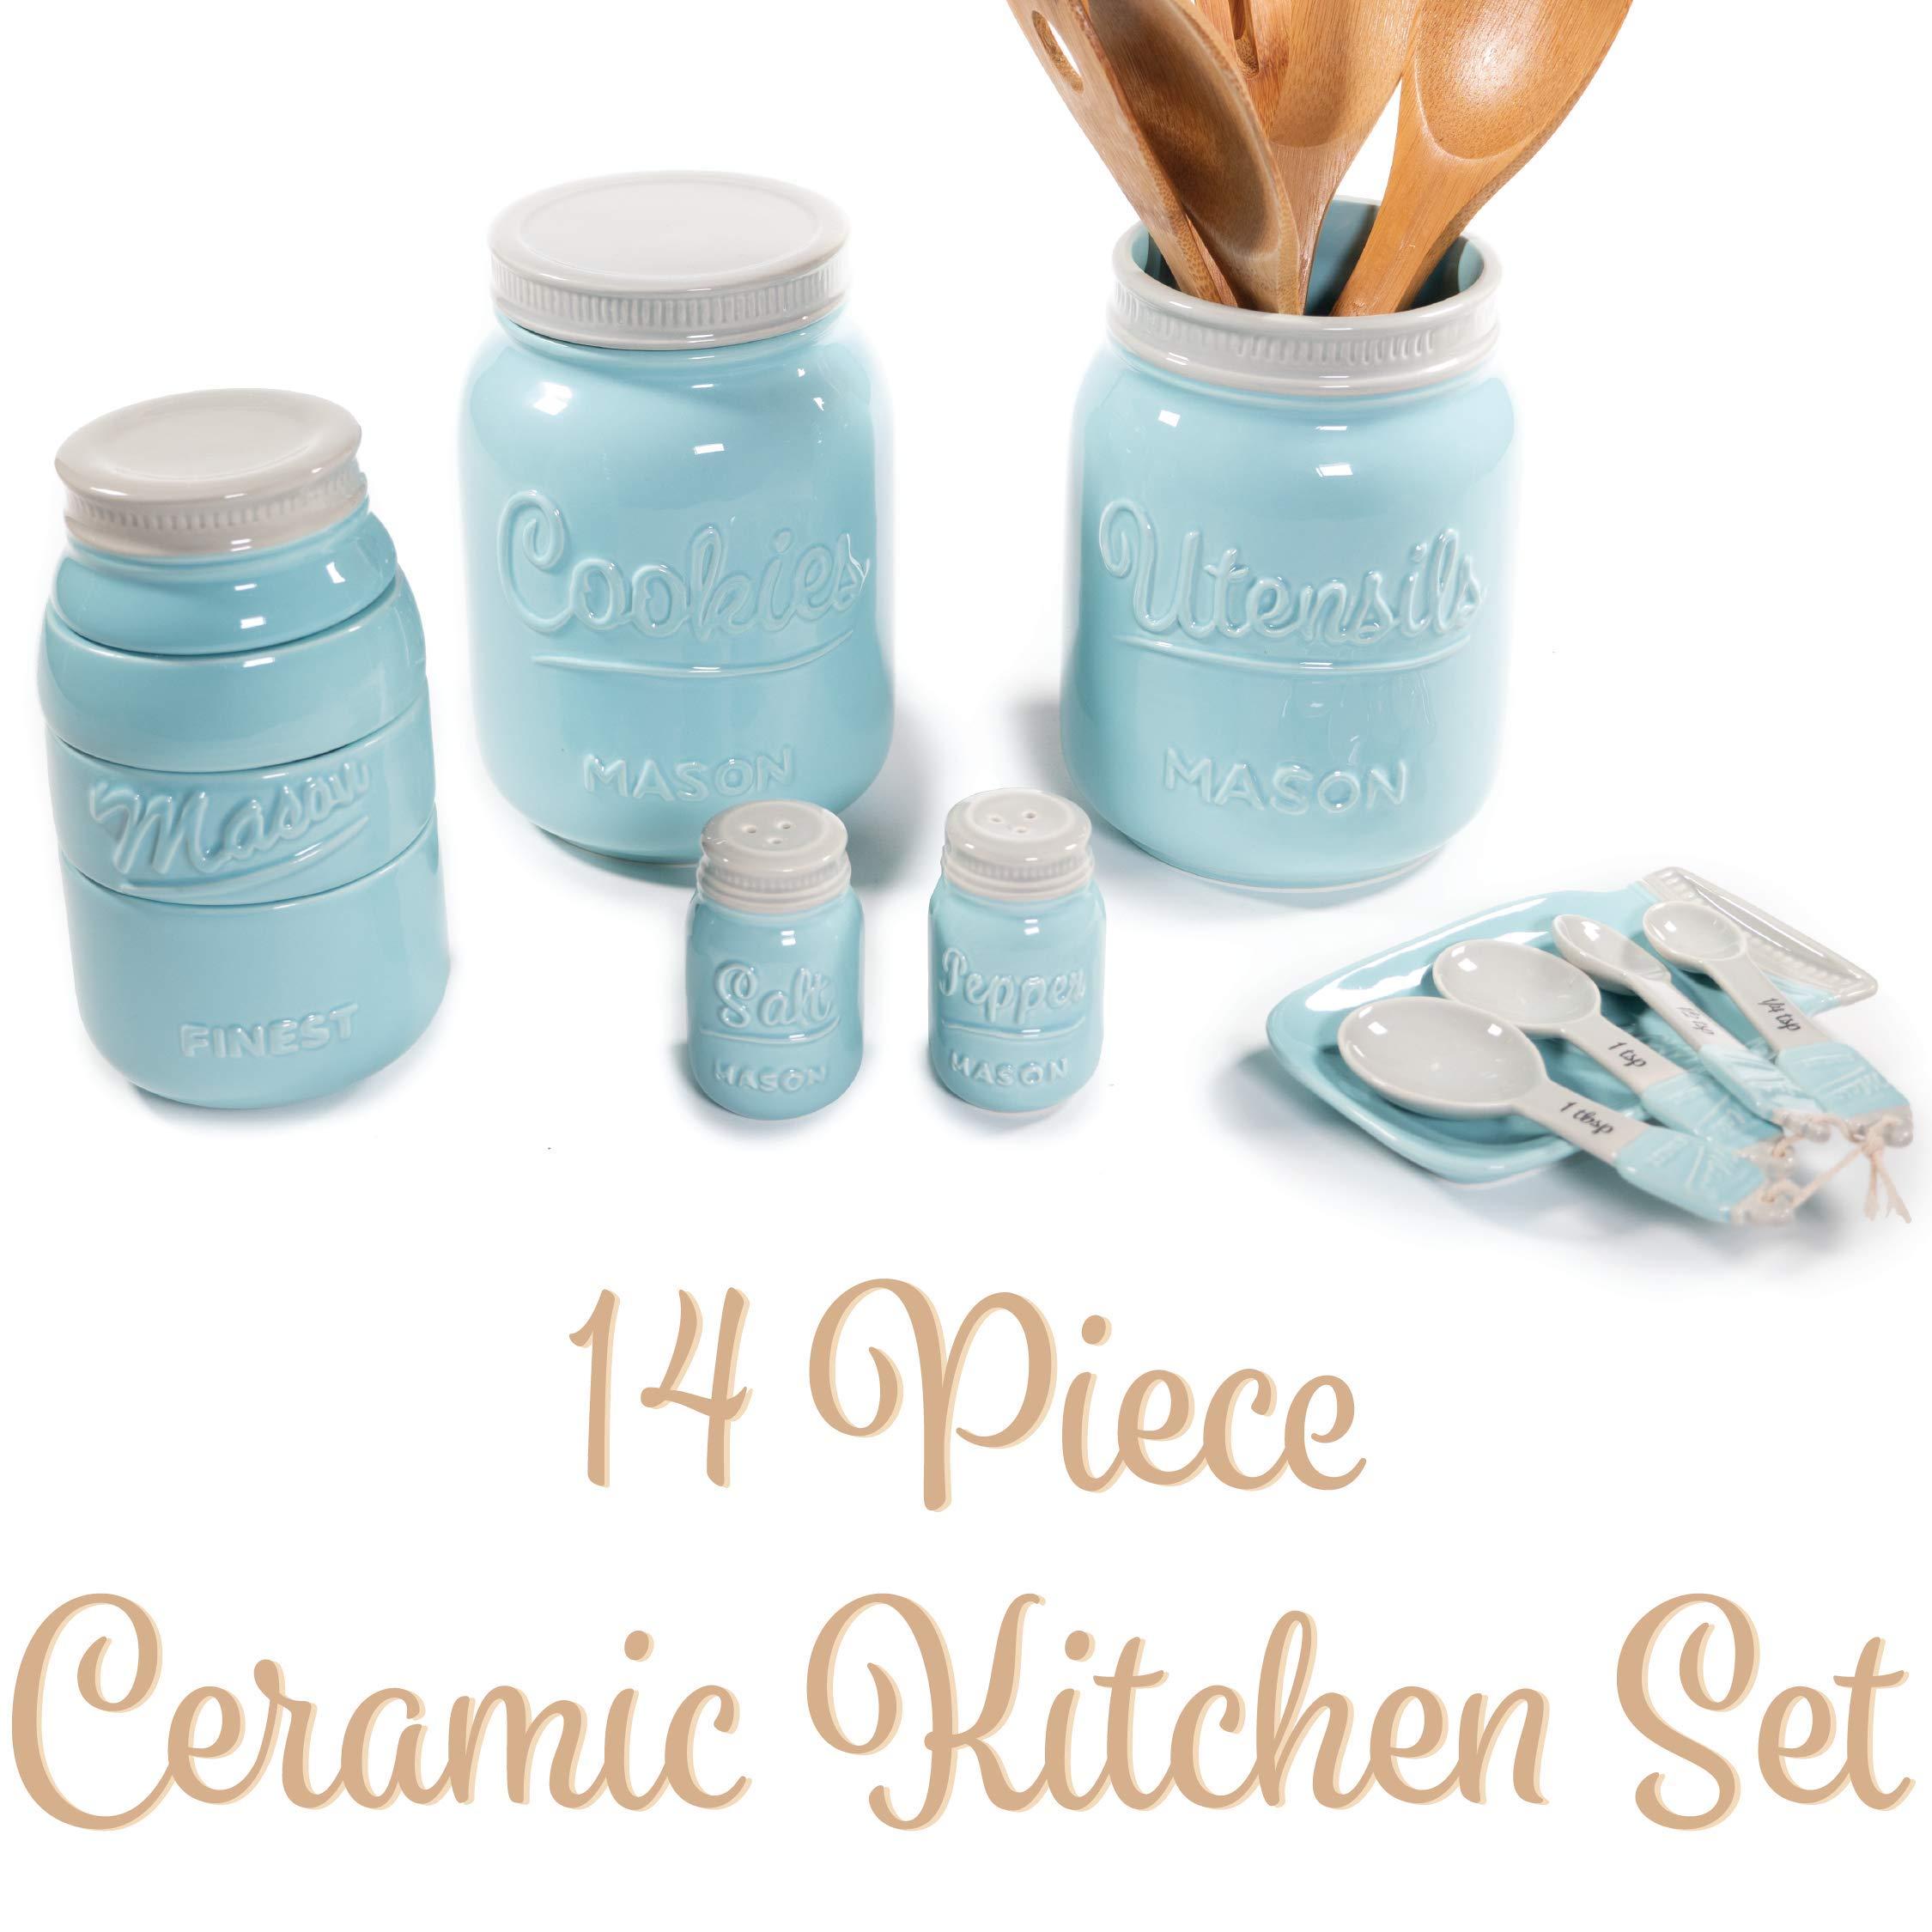 Mason Jar Kitchen Utensil Set - Includes Cookie Jar, Utensil Holder, Measuring Cups, Spoon Rest, Measuring Spoons & Salt/Pepper Shakers (Blue) by Sparrow Decor